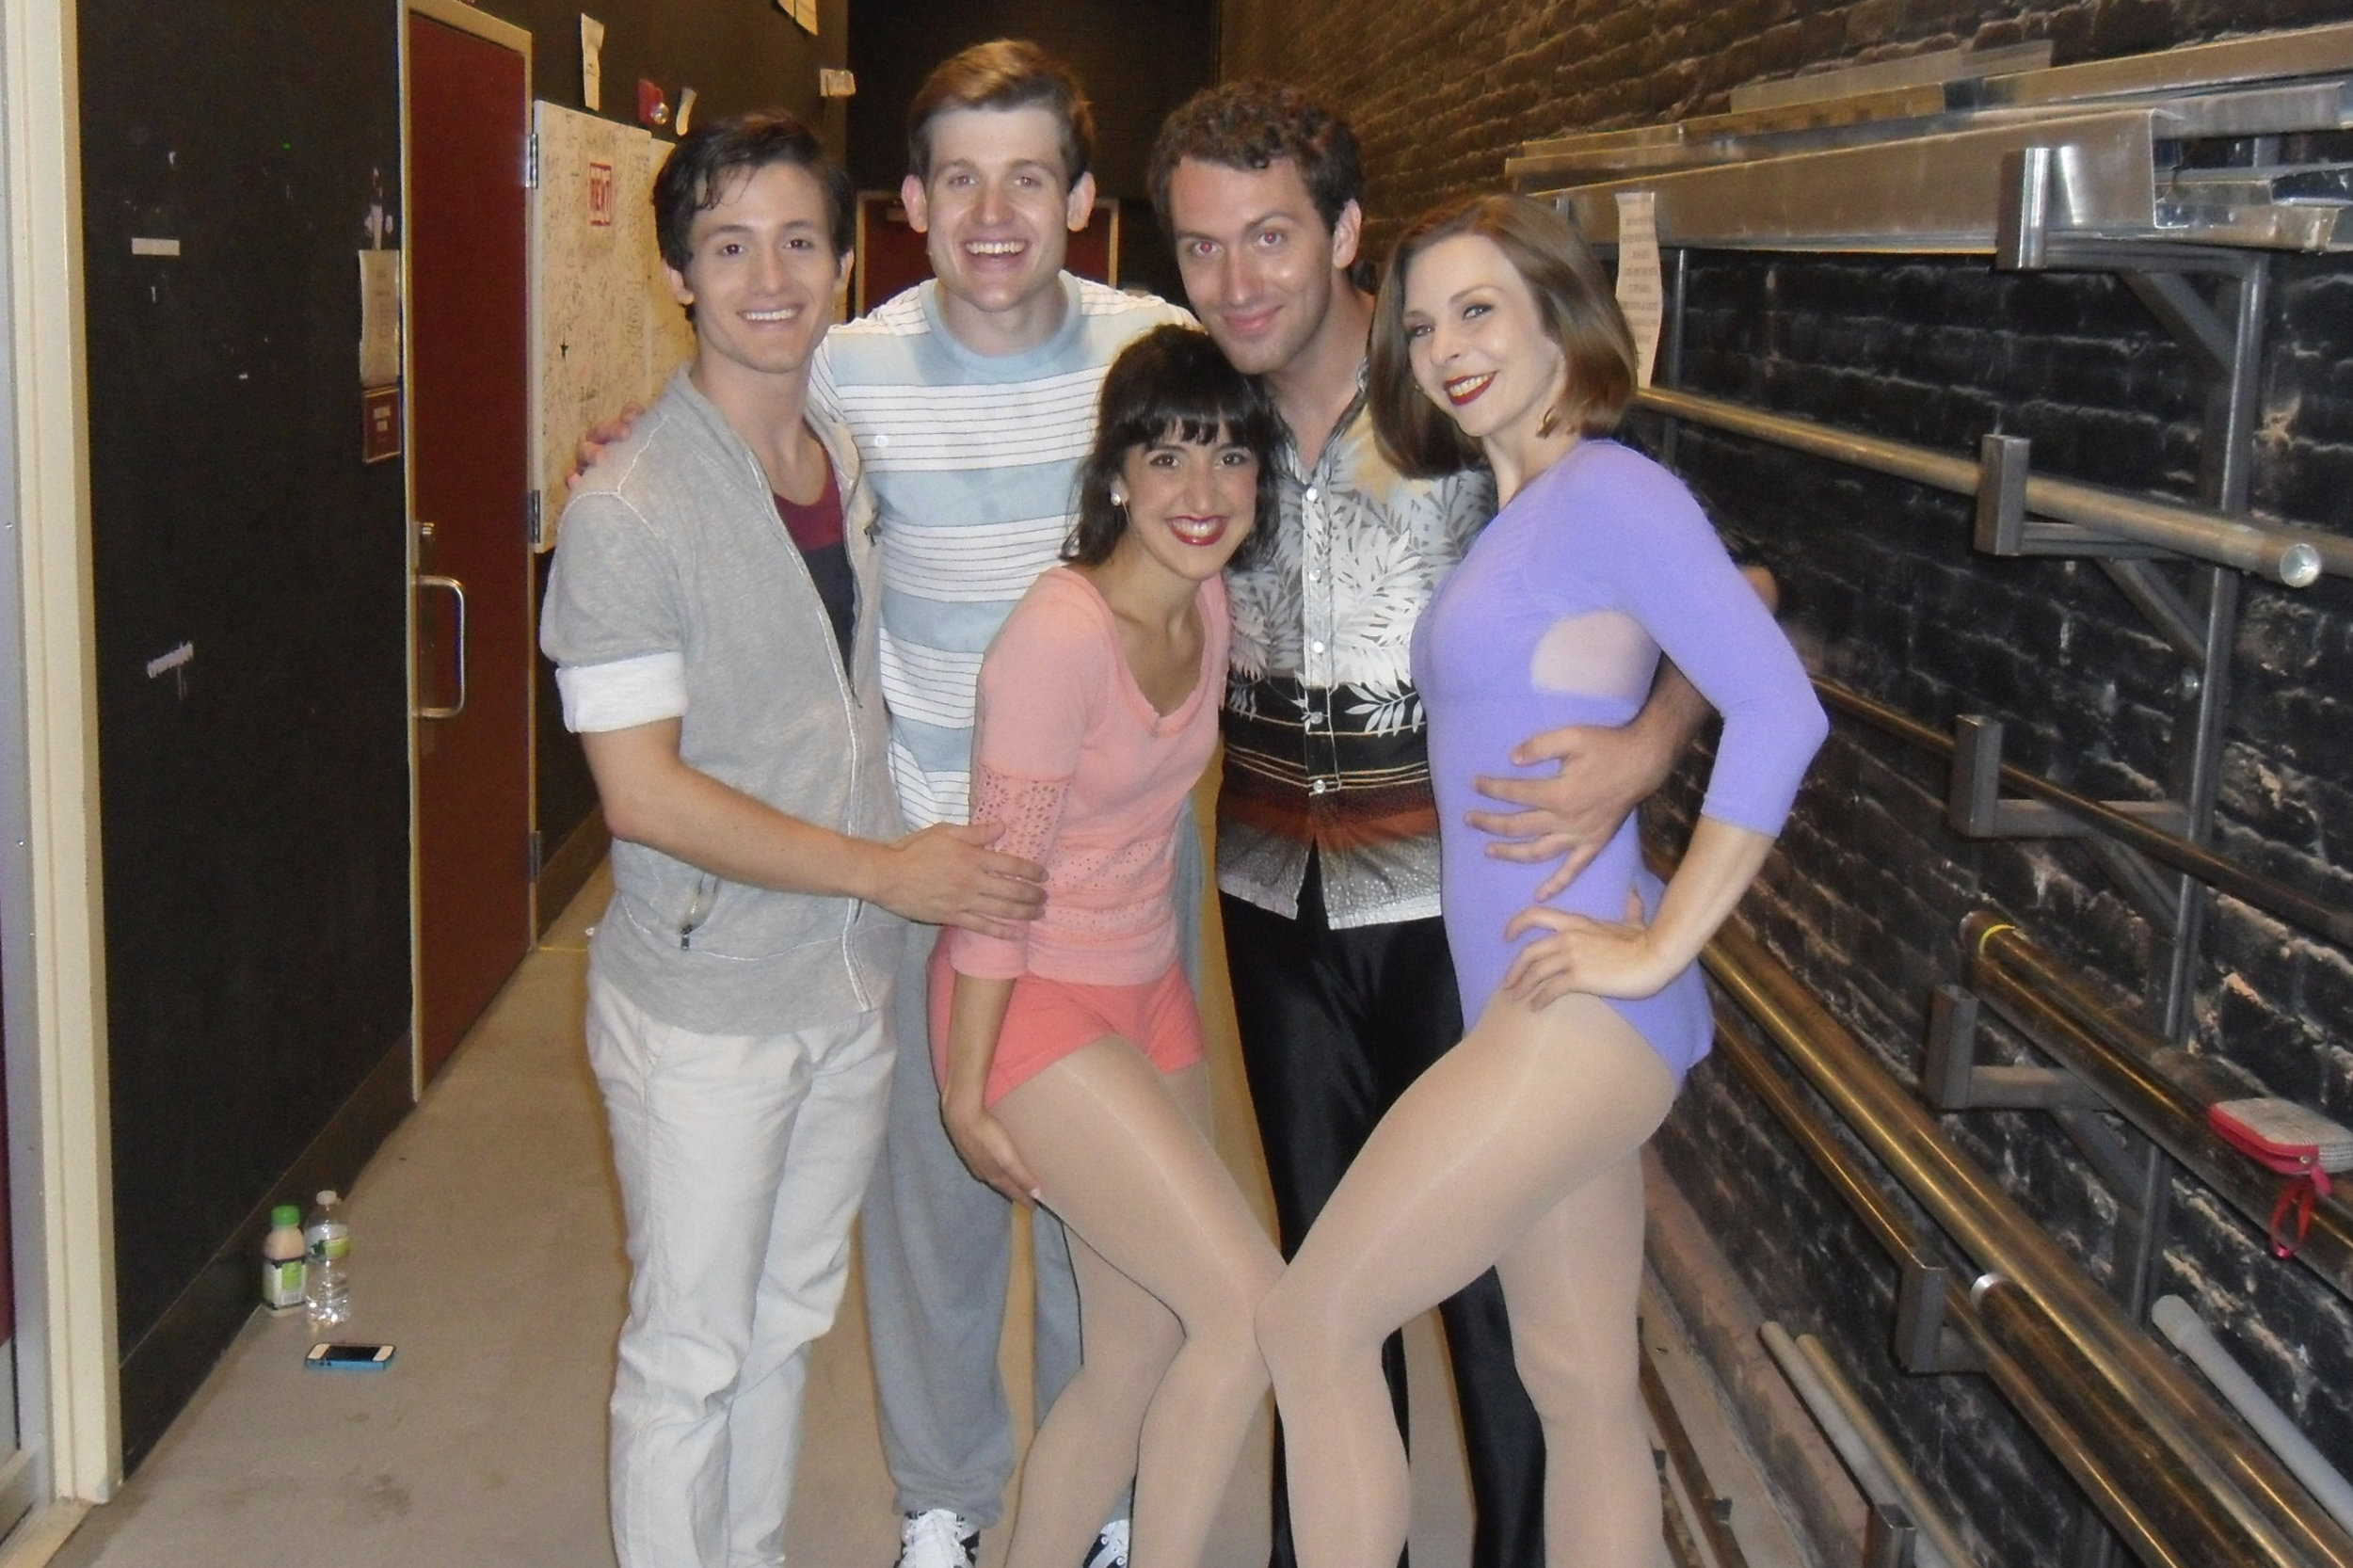 Epic talent in this cast! With Eddie Gutierrez (Paul), Giovanni Bonaventura (Mark), Andrew Hodge (Bobby), & Natalie Caruncho (Diana).